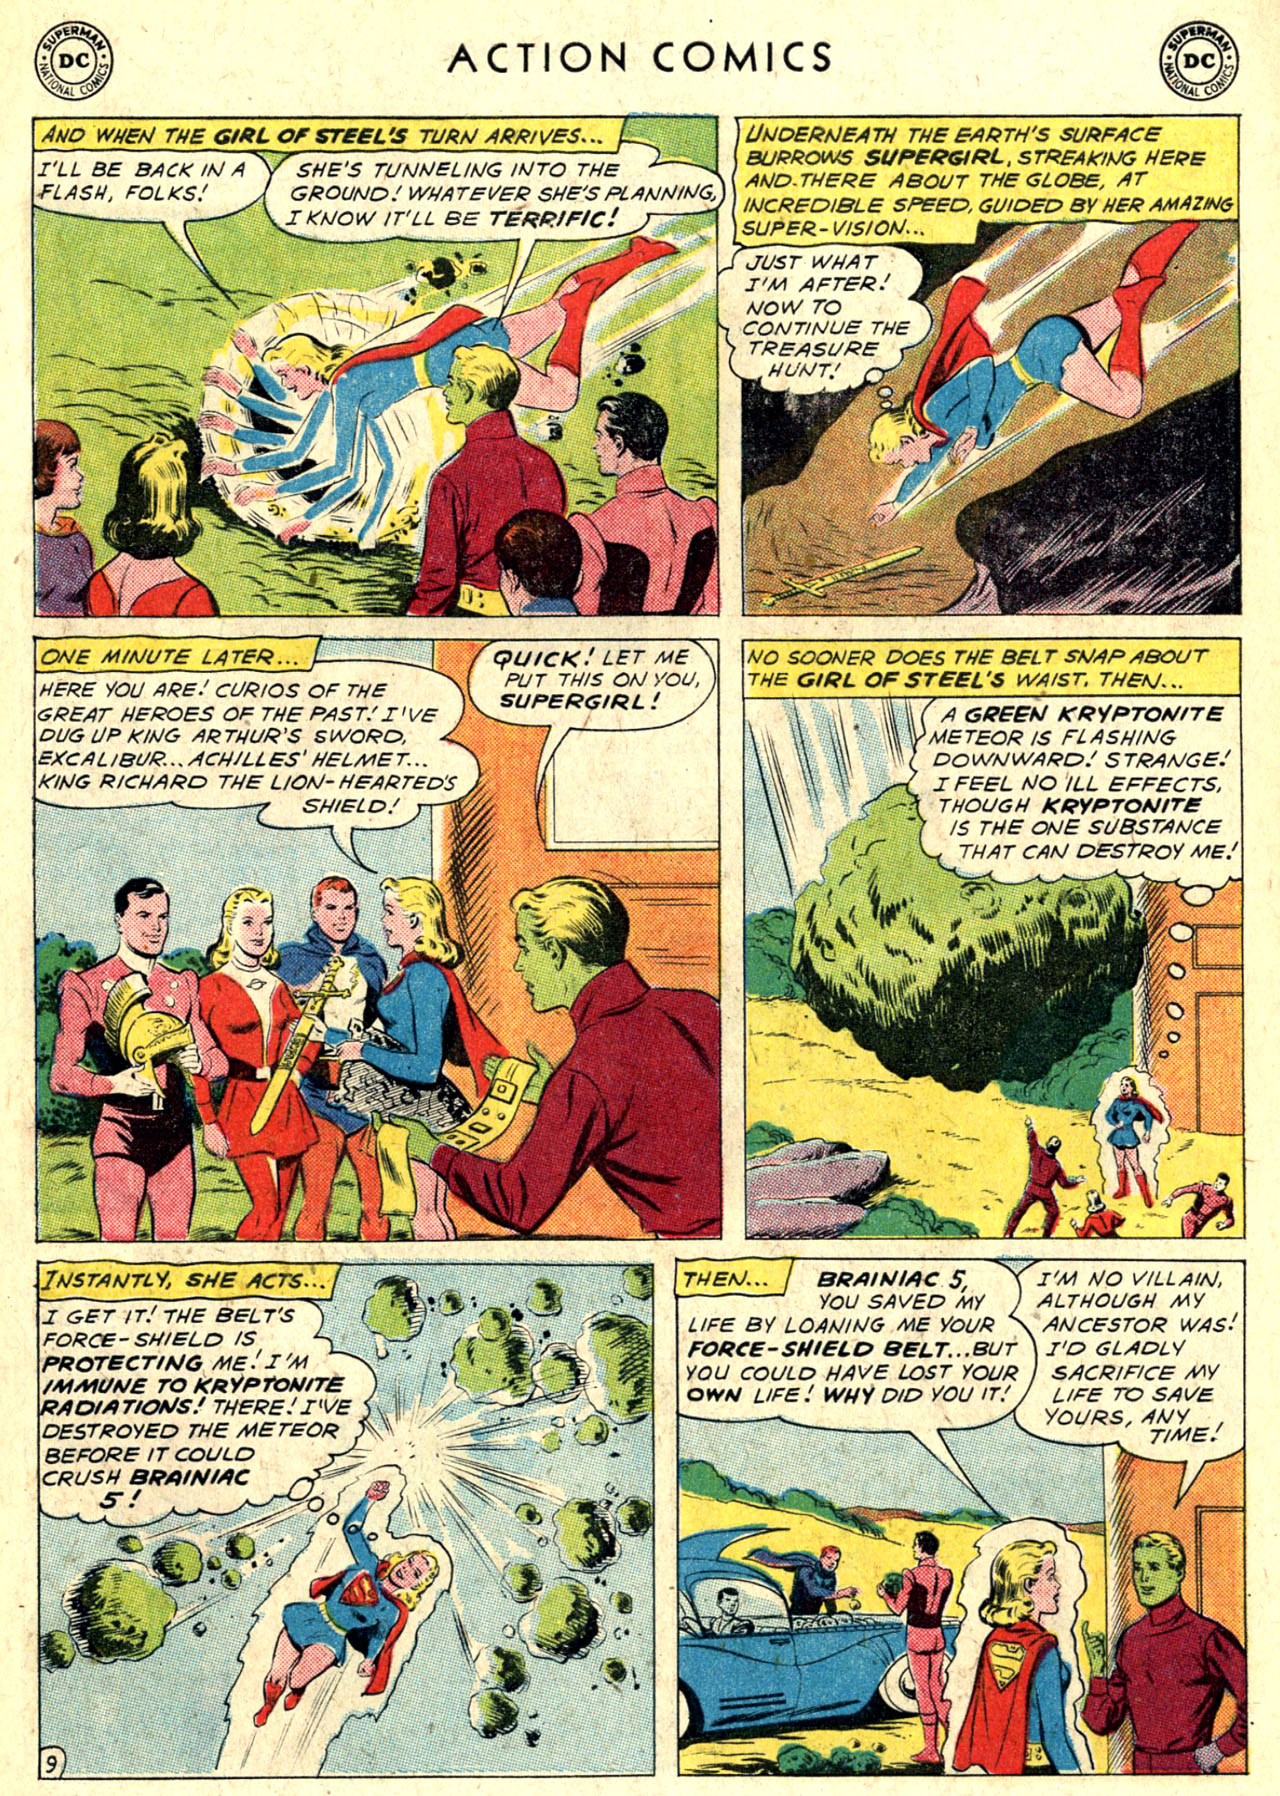 Action Comics (1938) 276 Page 27